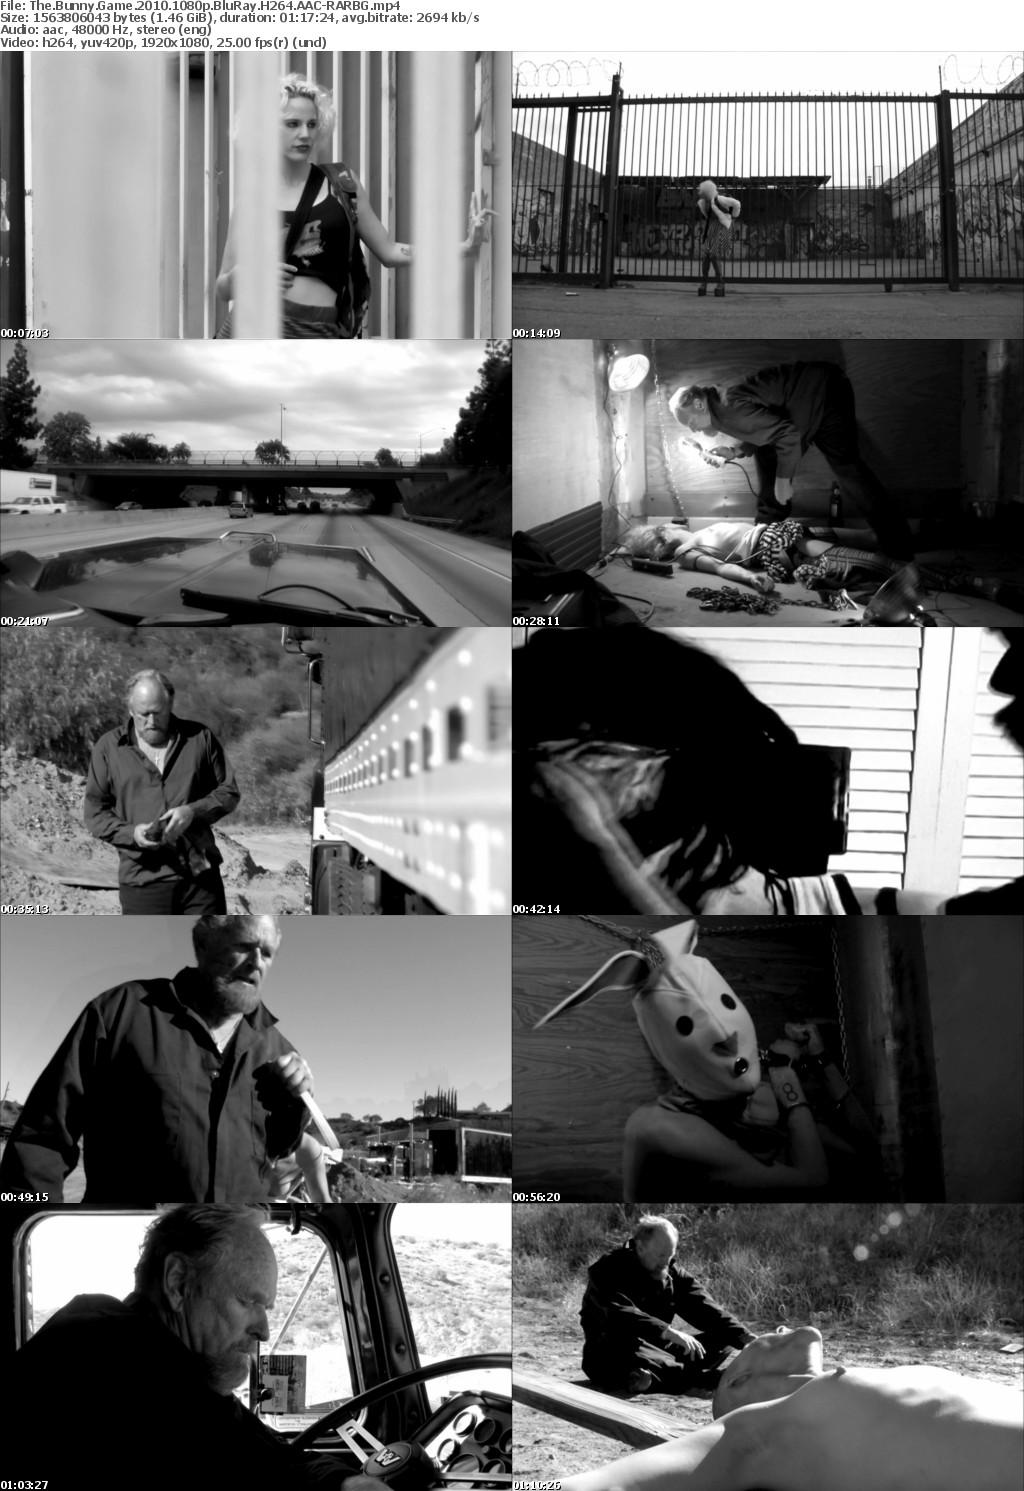 The Bunny Game (2010) 1080p BluRay H264 AAC-RARBG